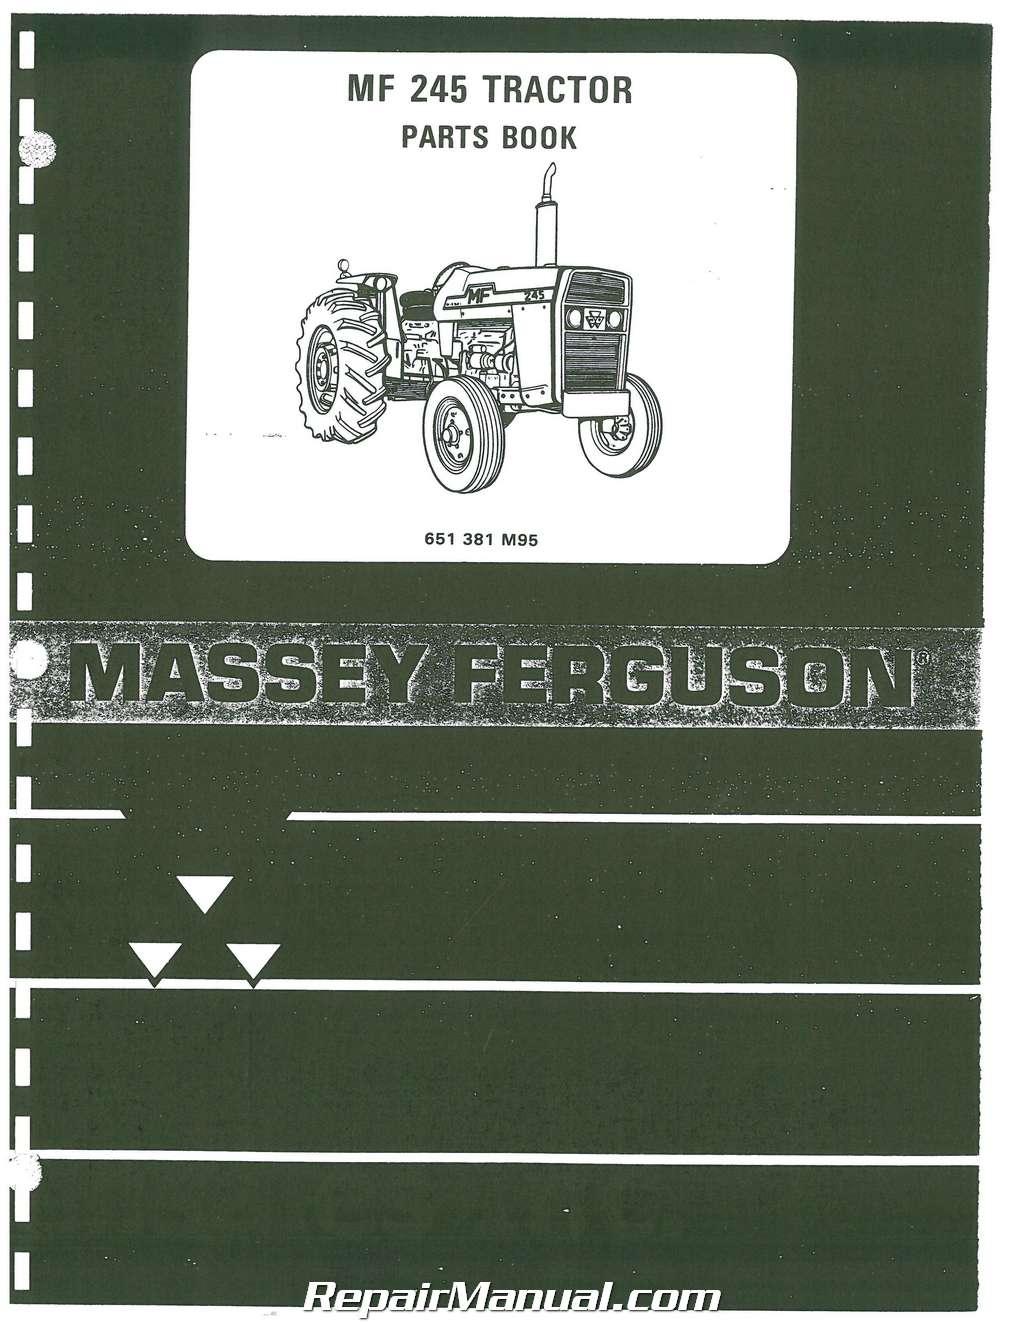 Massey Ferguson Replacement Parts : Massey ferguson parts manual